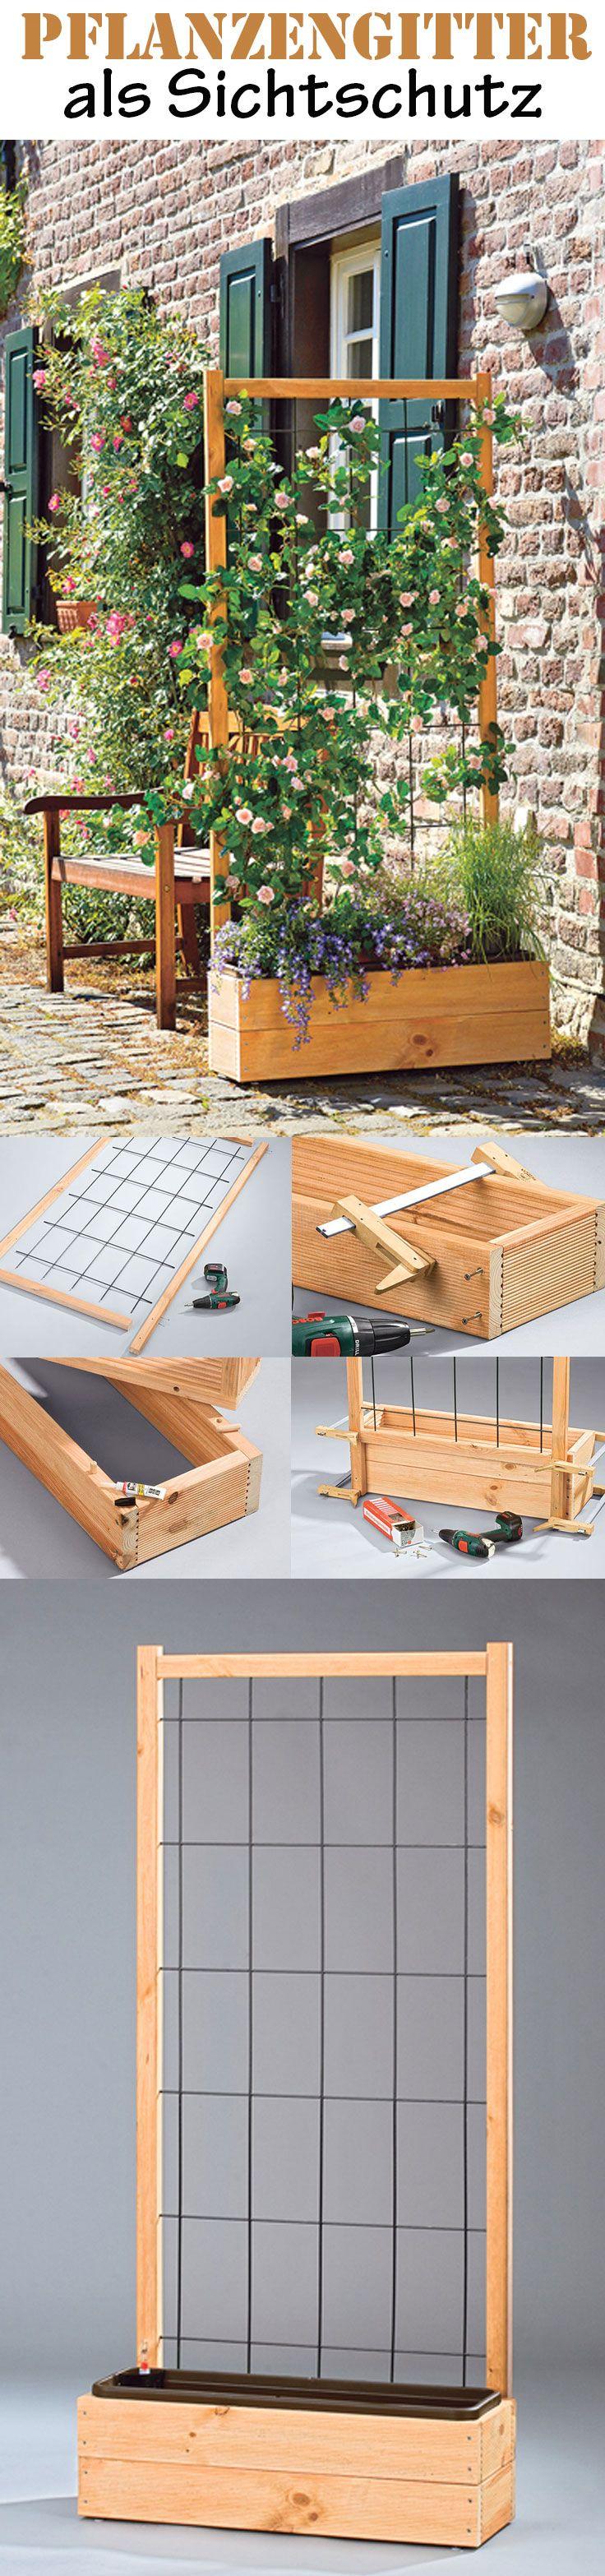 sichtschutz selbst bauen best pergola als sichtschutz pergola fa r den pergola sichtschutz. Black Bedroom Furniture Sets. Home Design Ideas